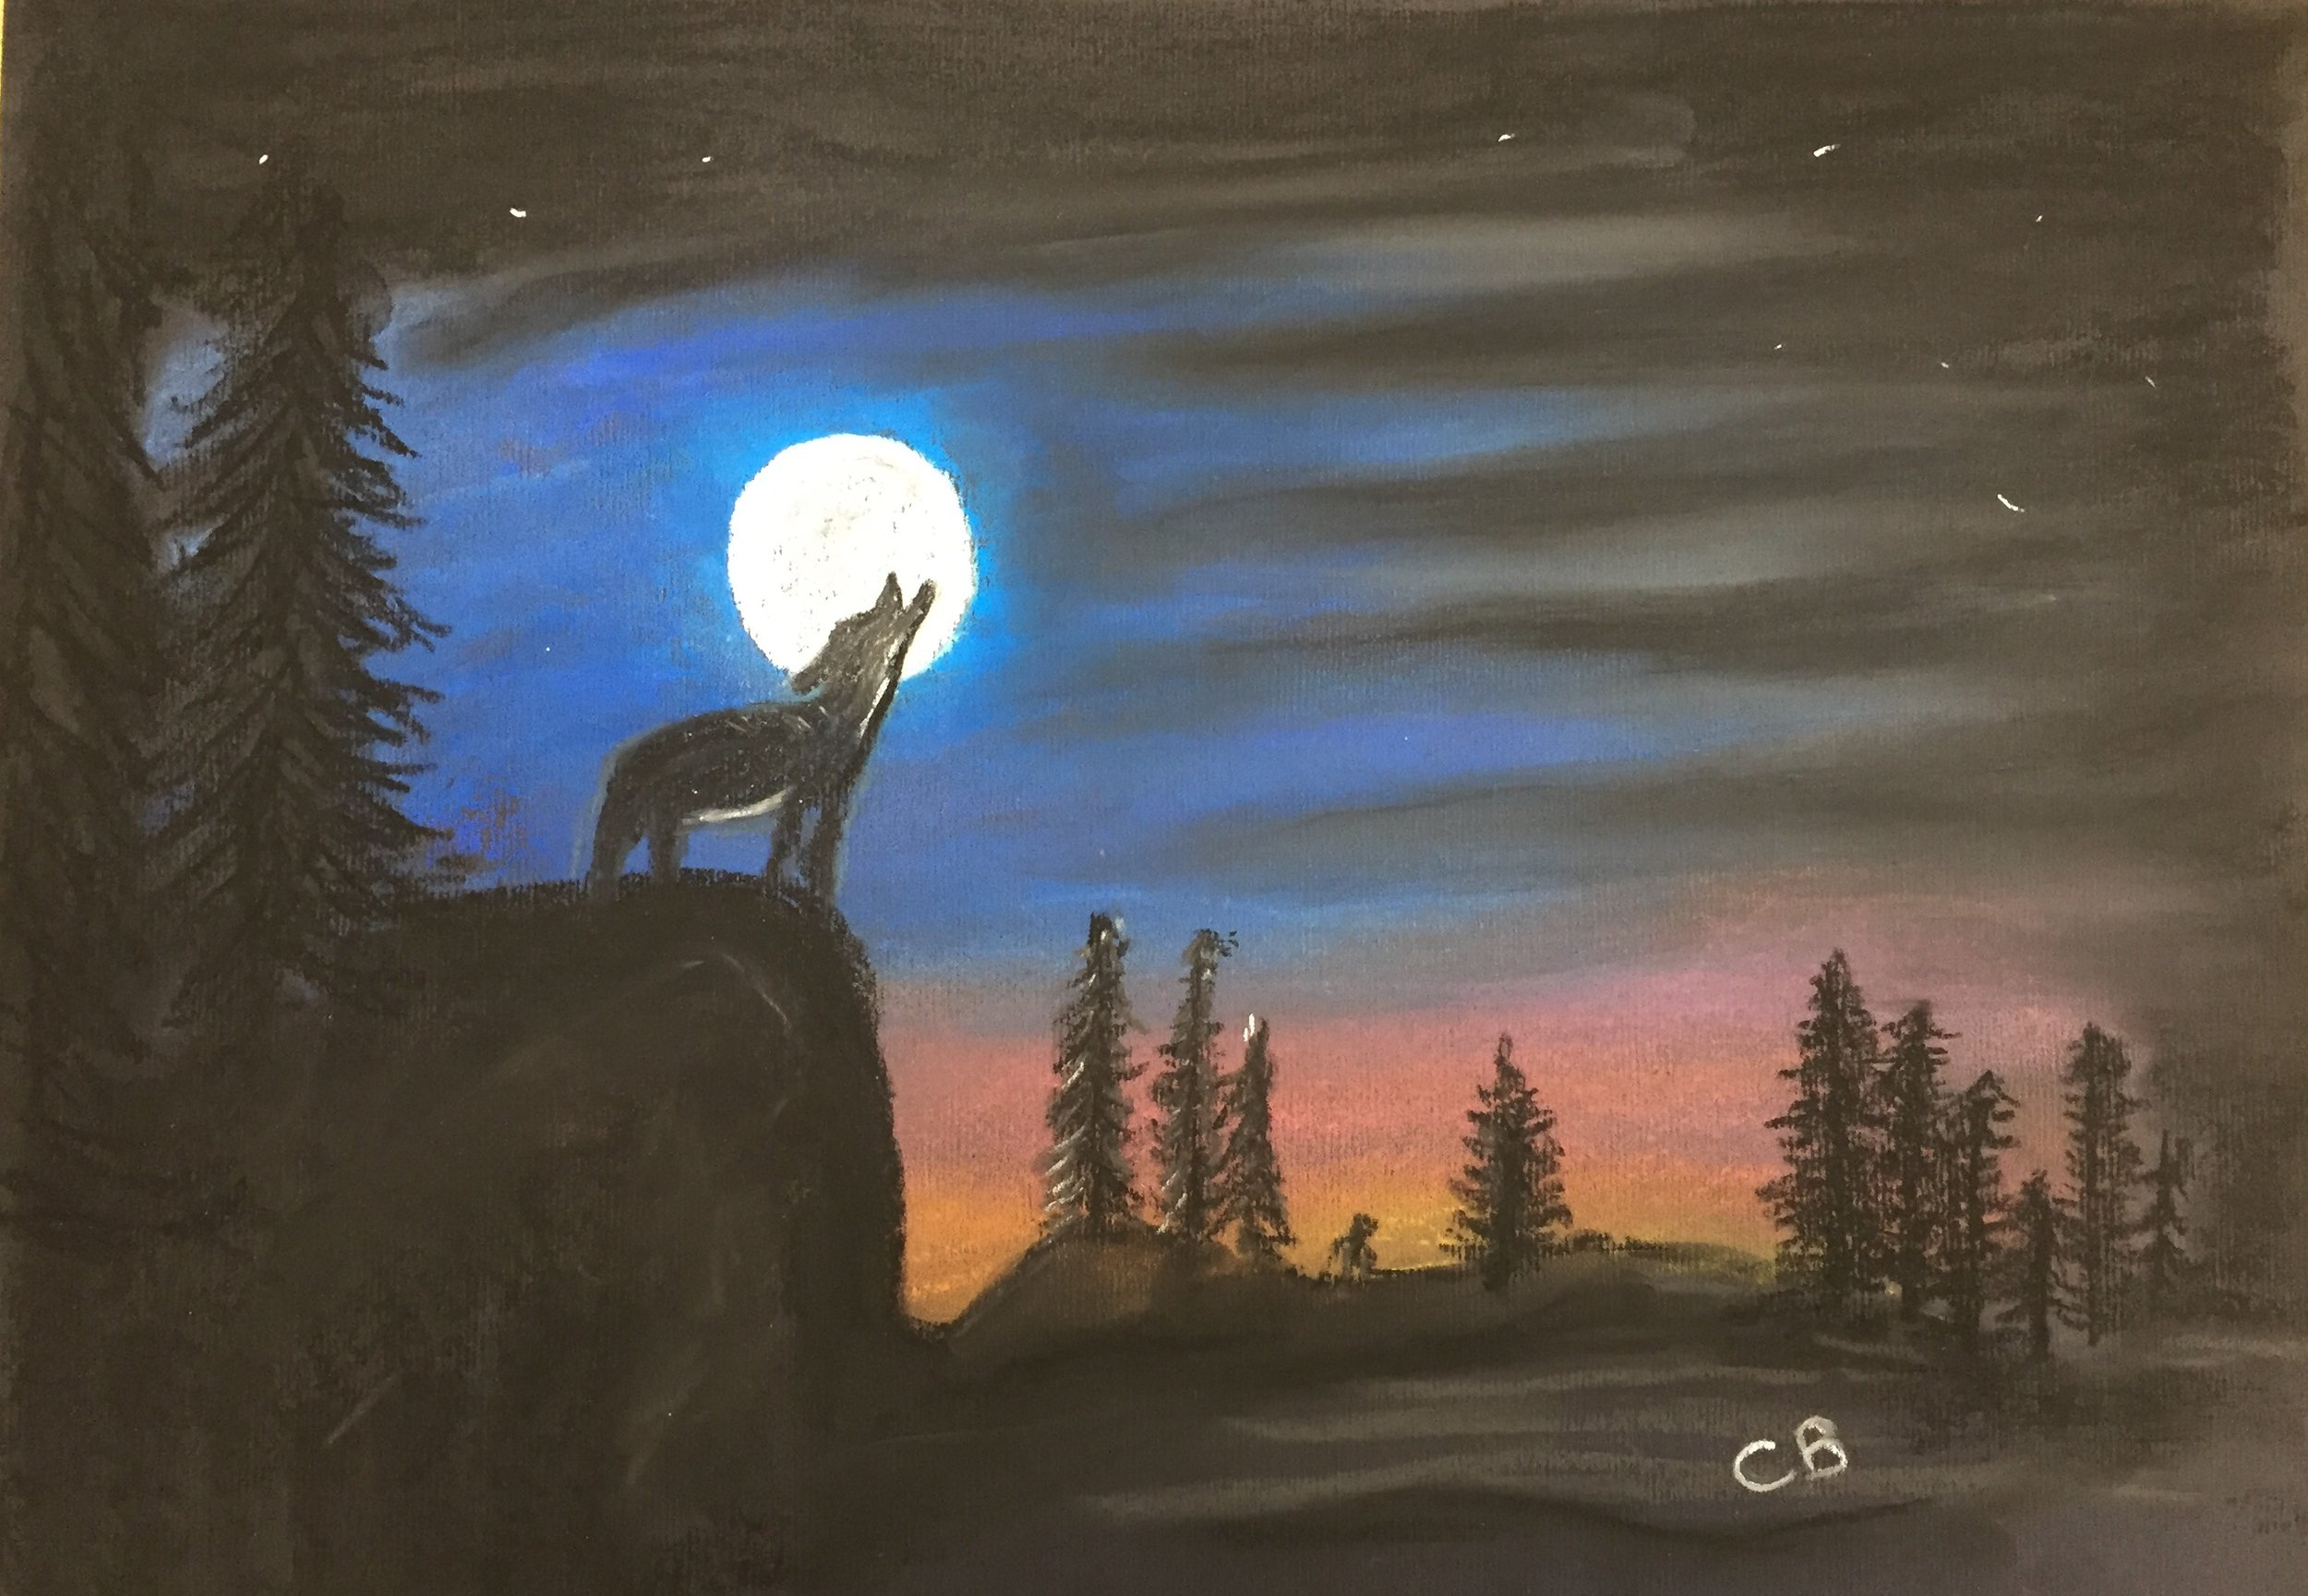 CB wolf.jpg